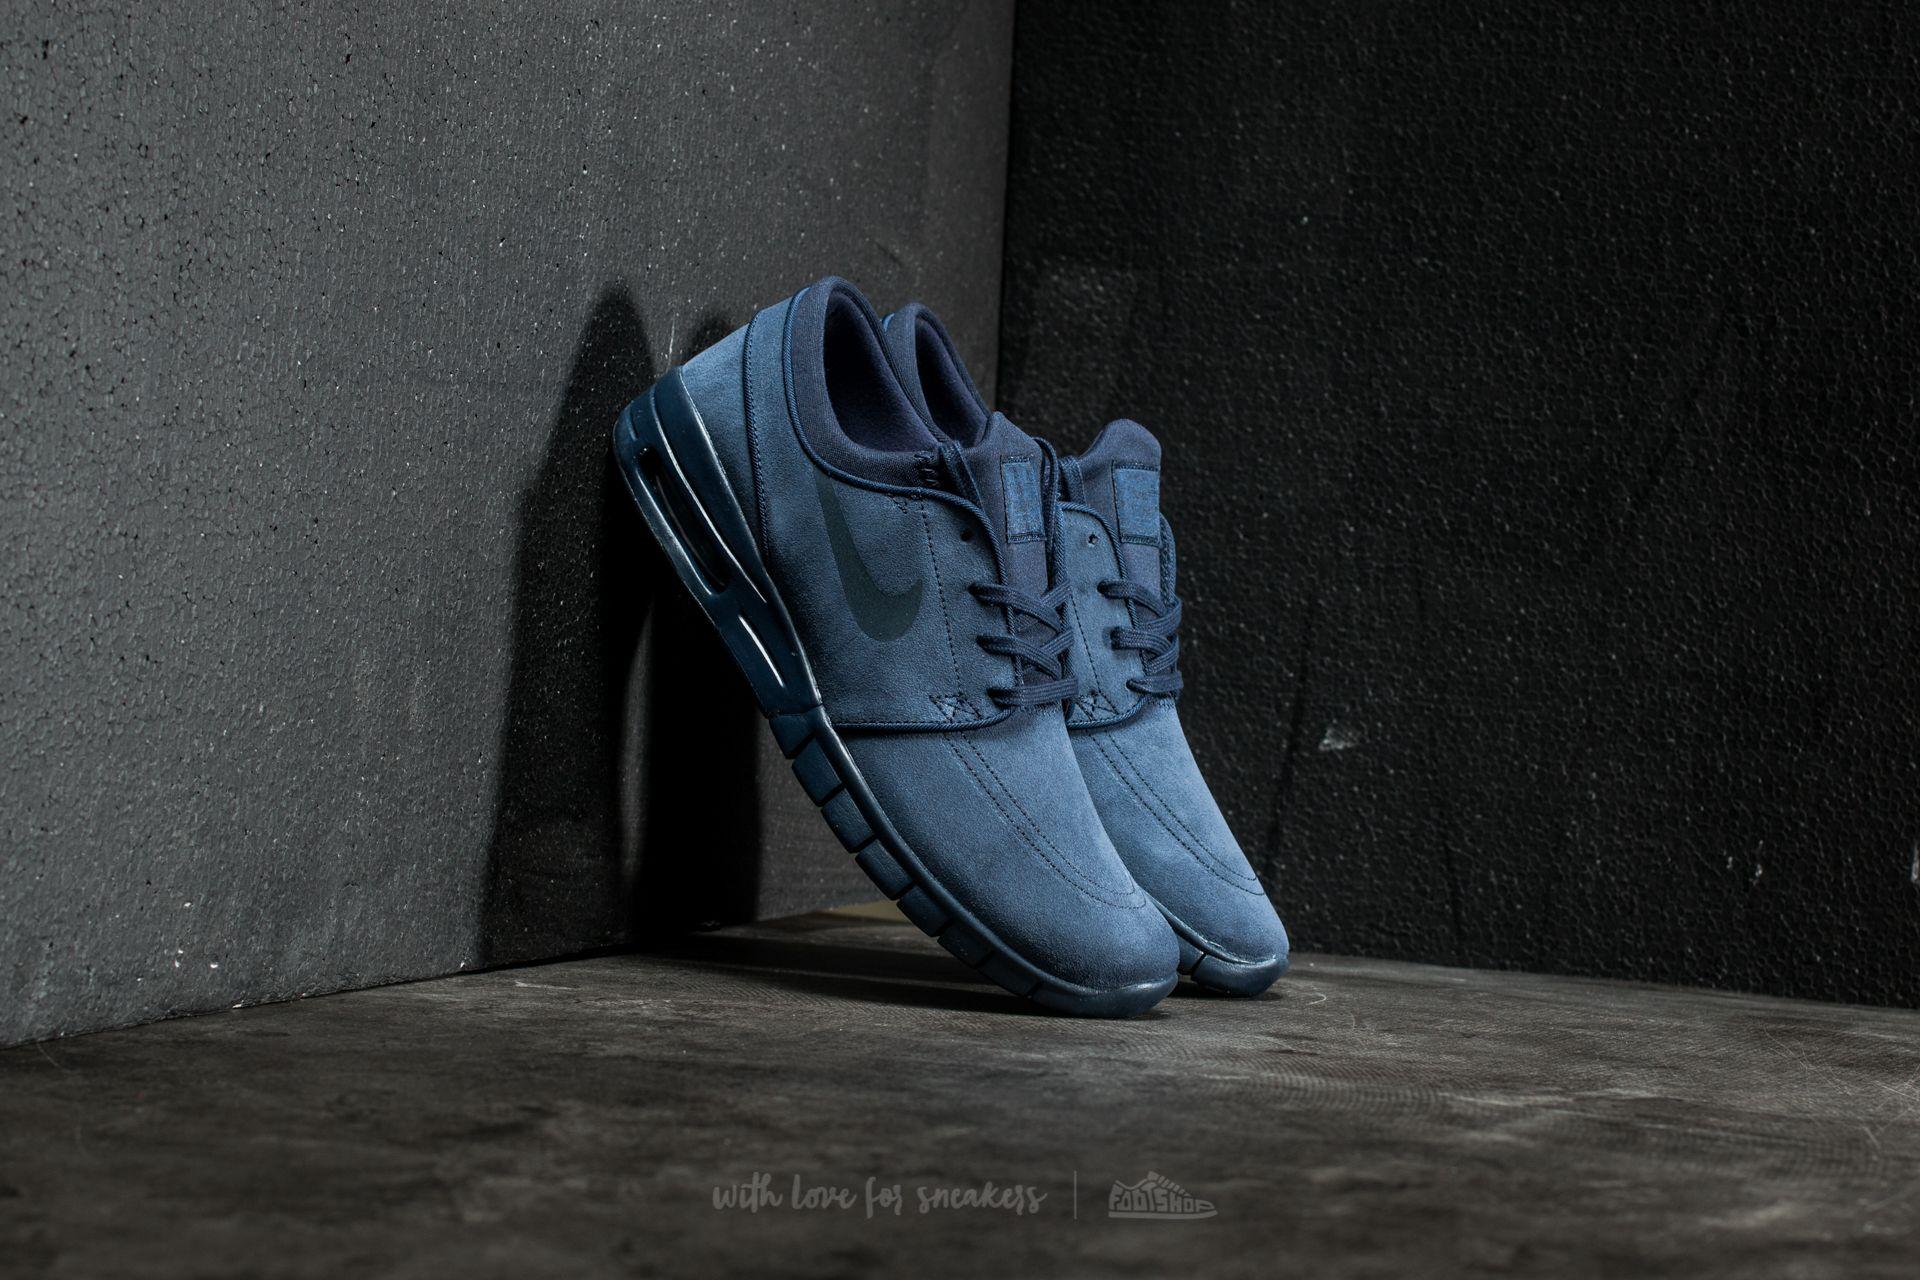 leather janoski max